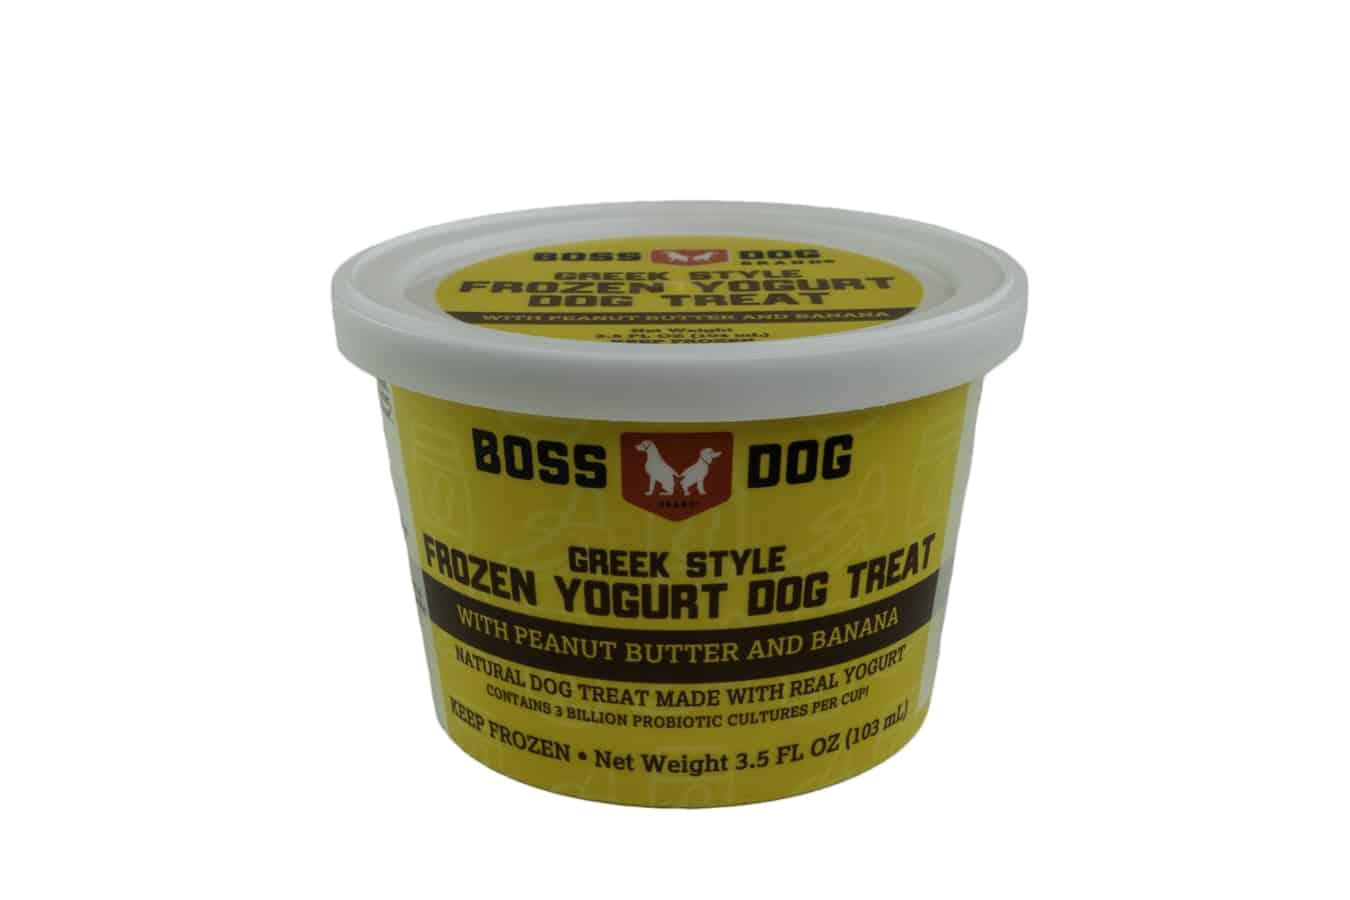 Boss Dog PB & Banana Frozen Yogurt Dog Treats, 3.5-oz, Single Cup